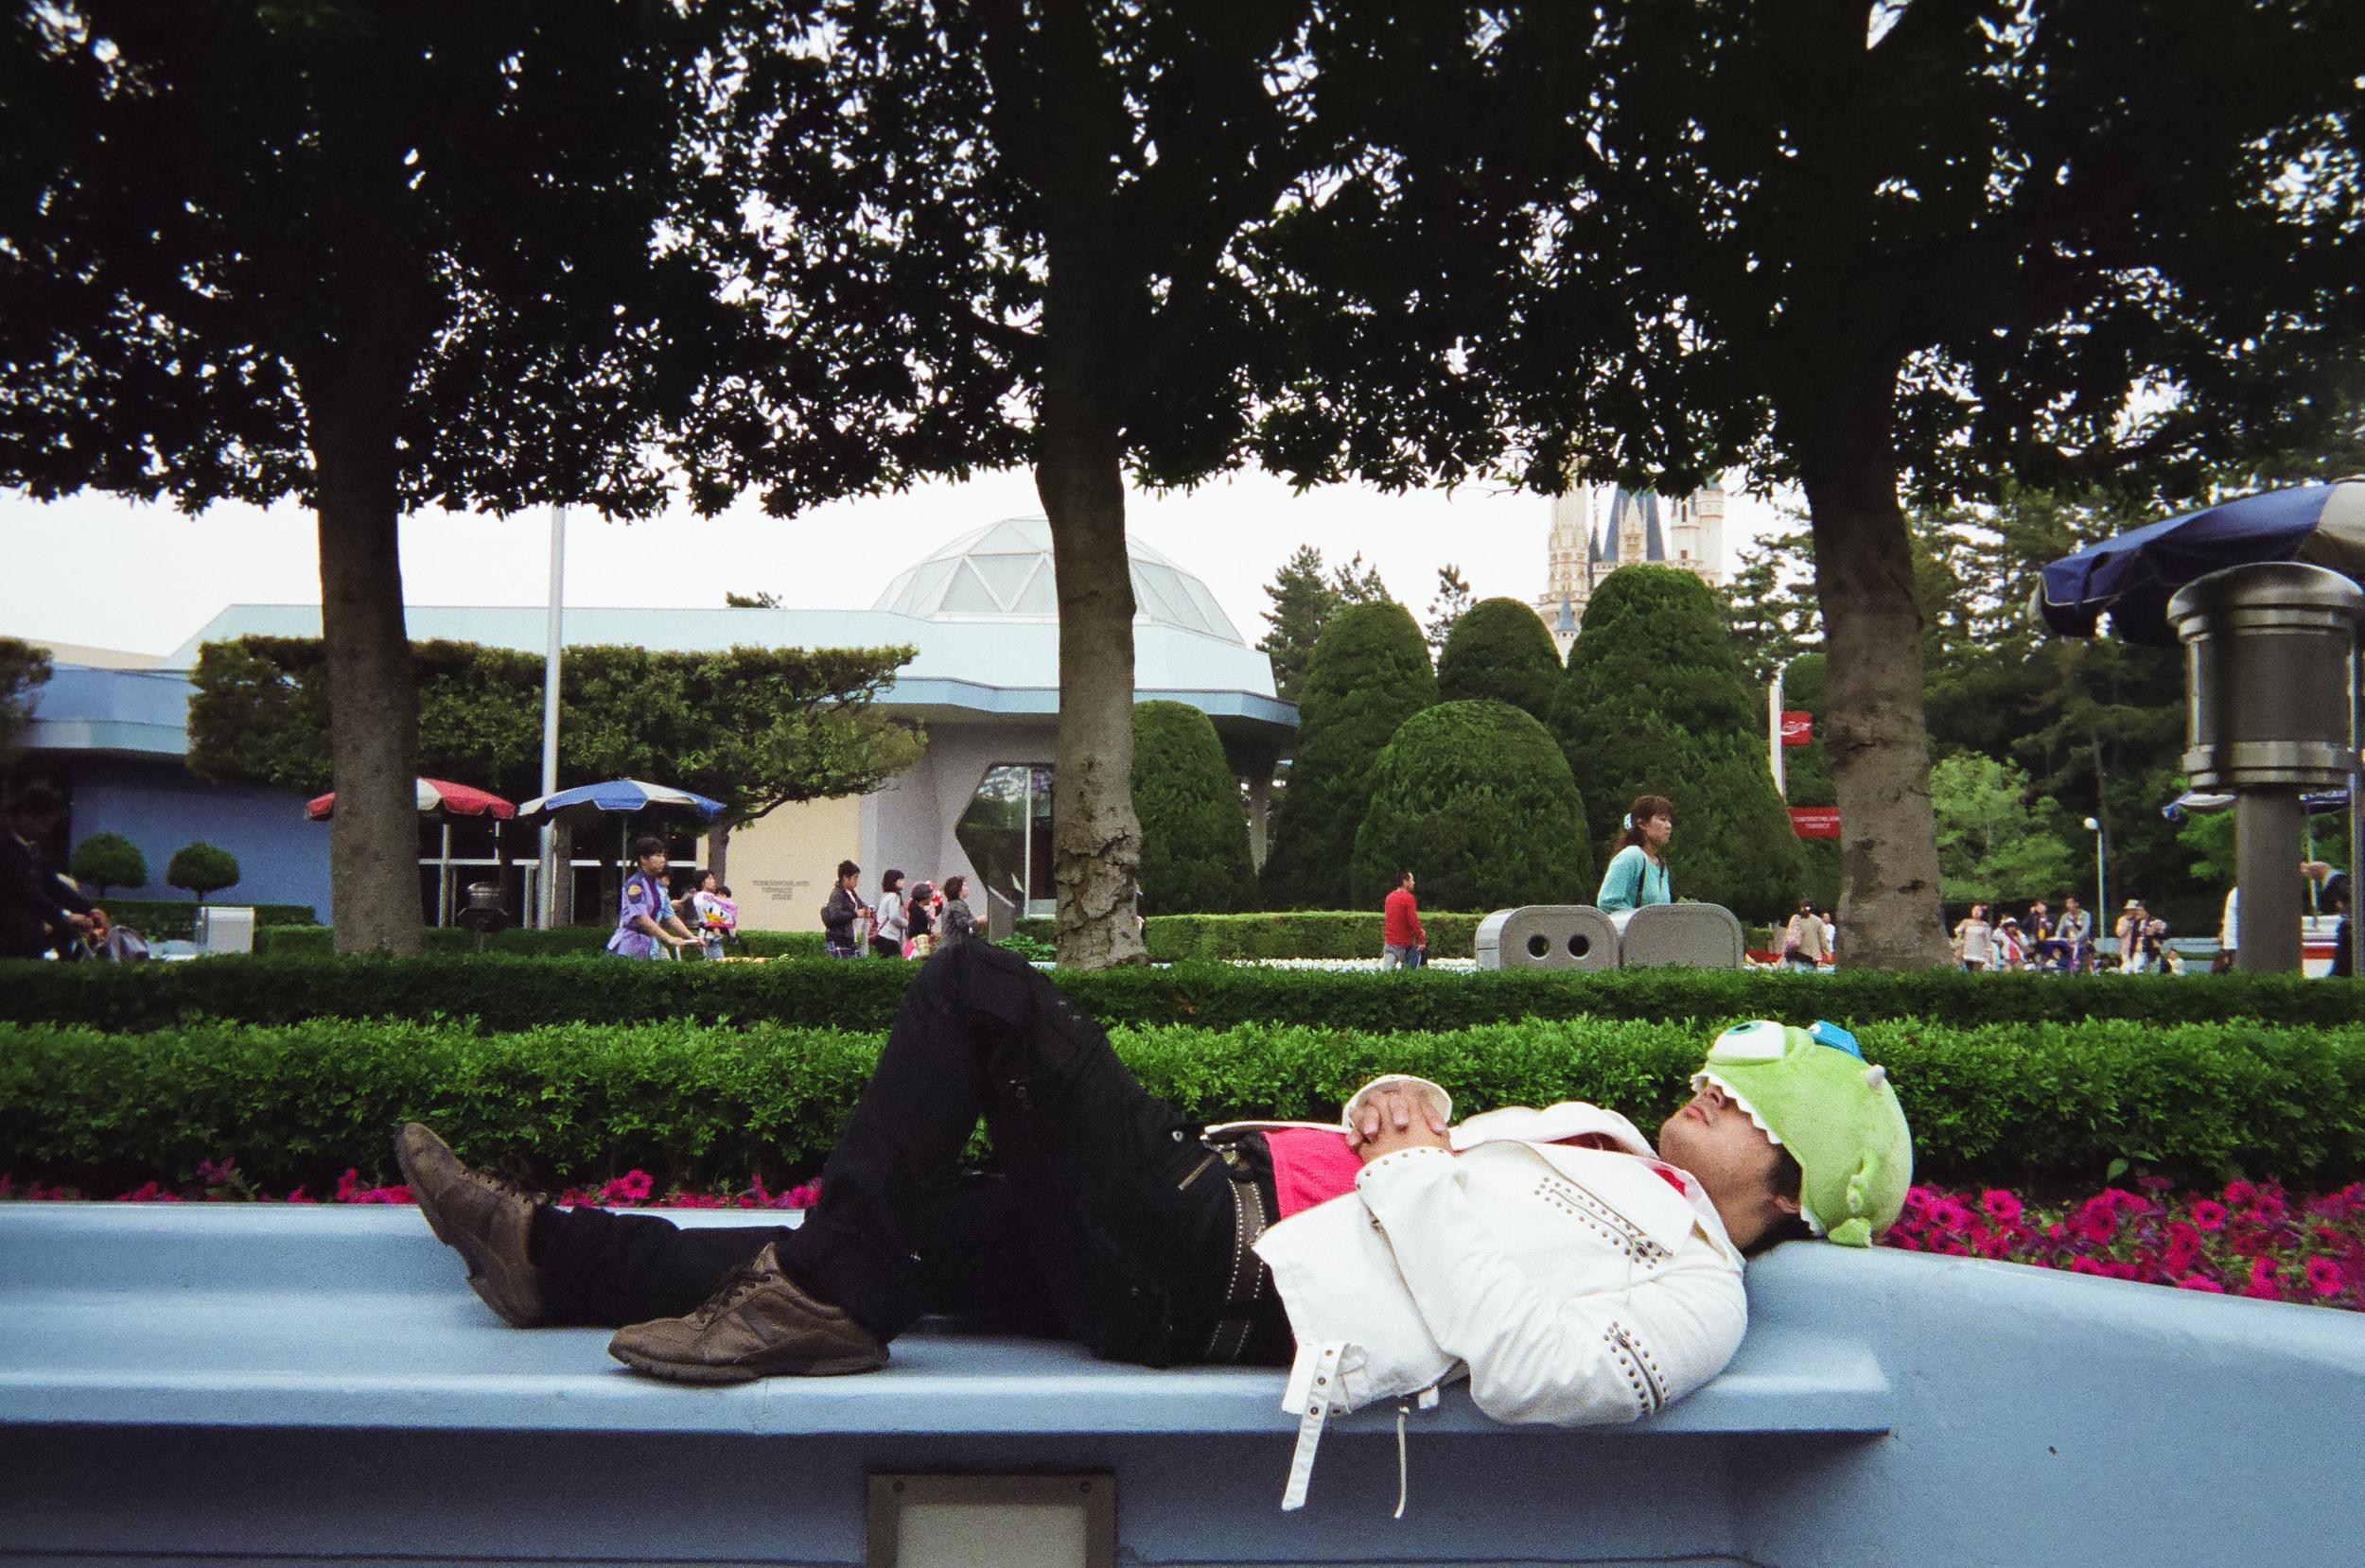 Taking a nap at Disneyland, Tokyo